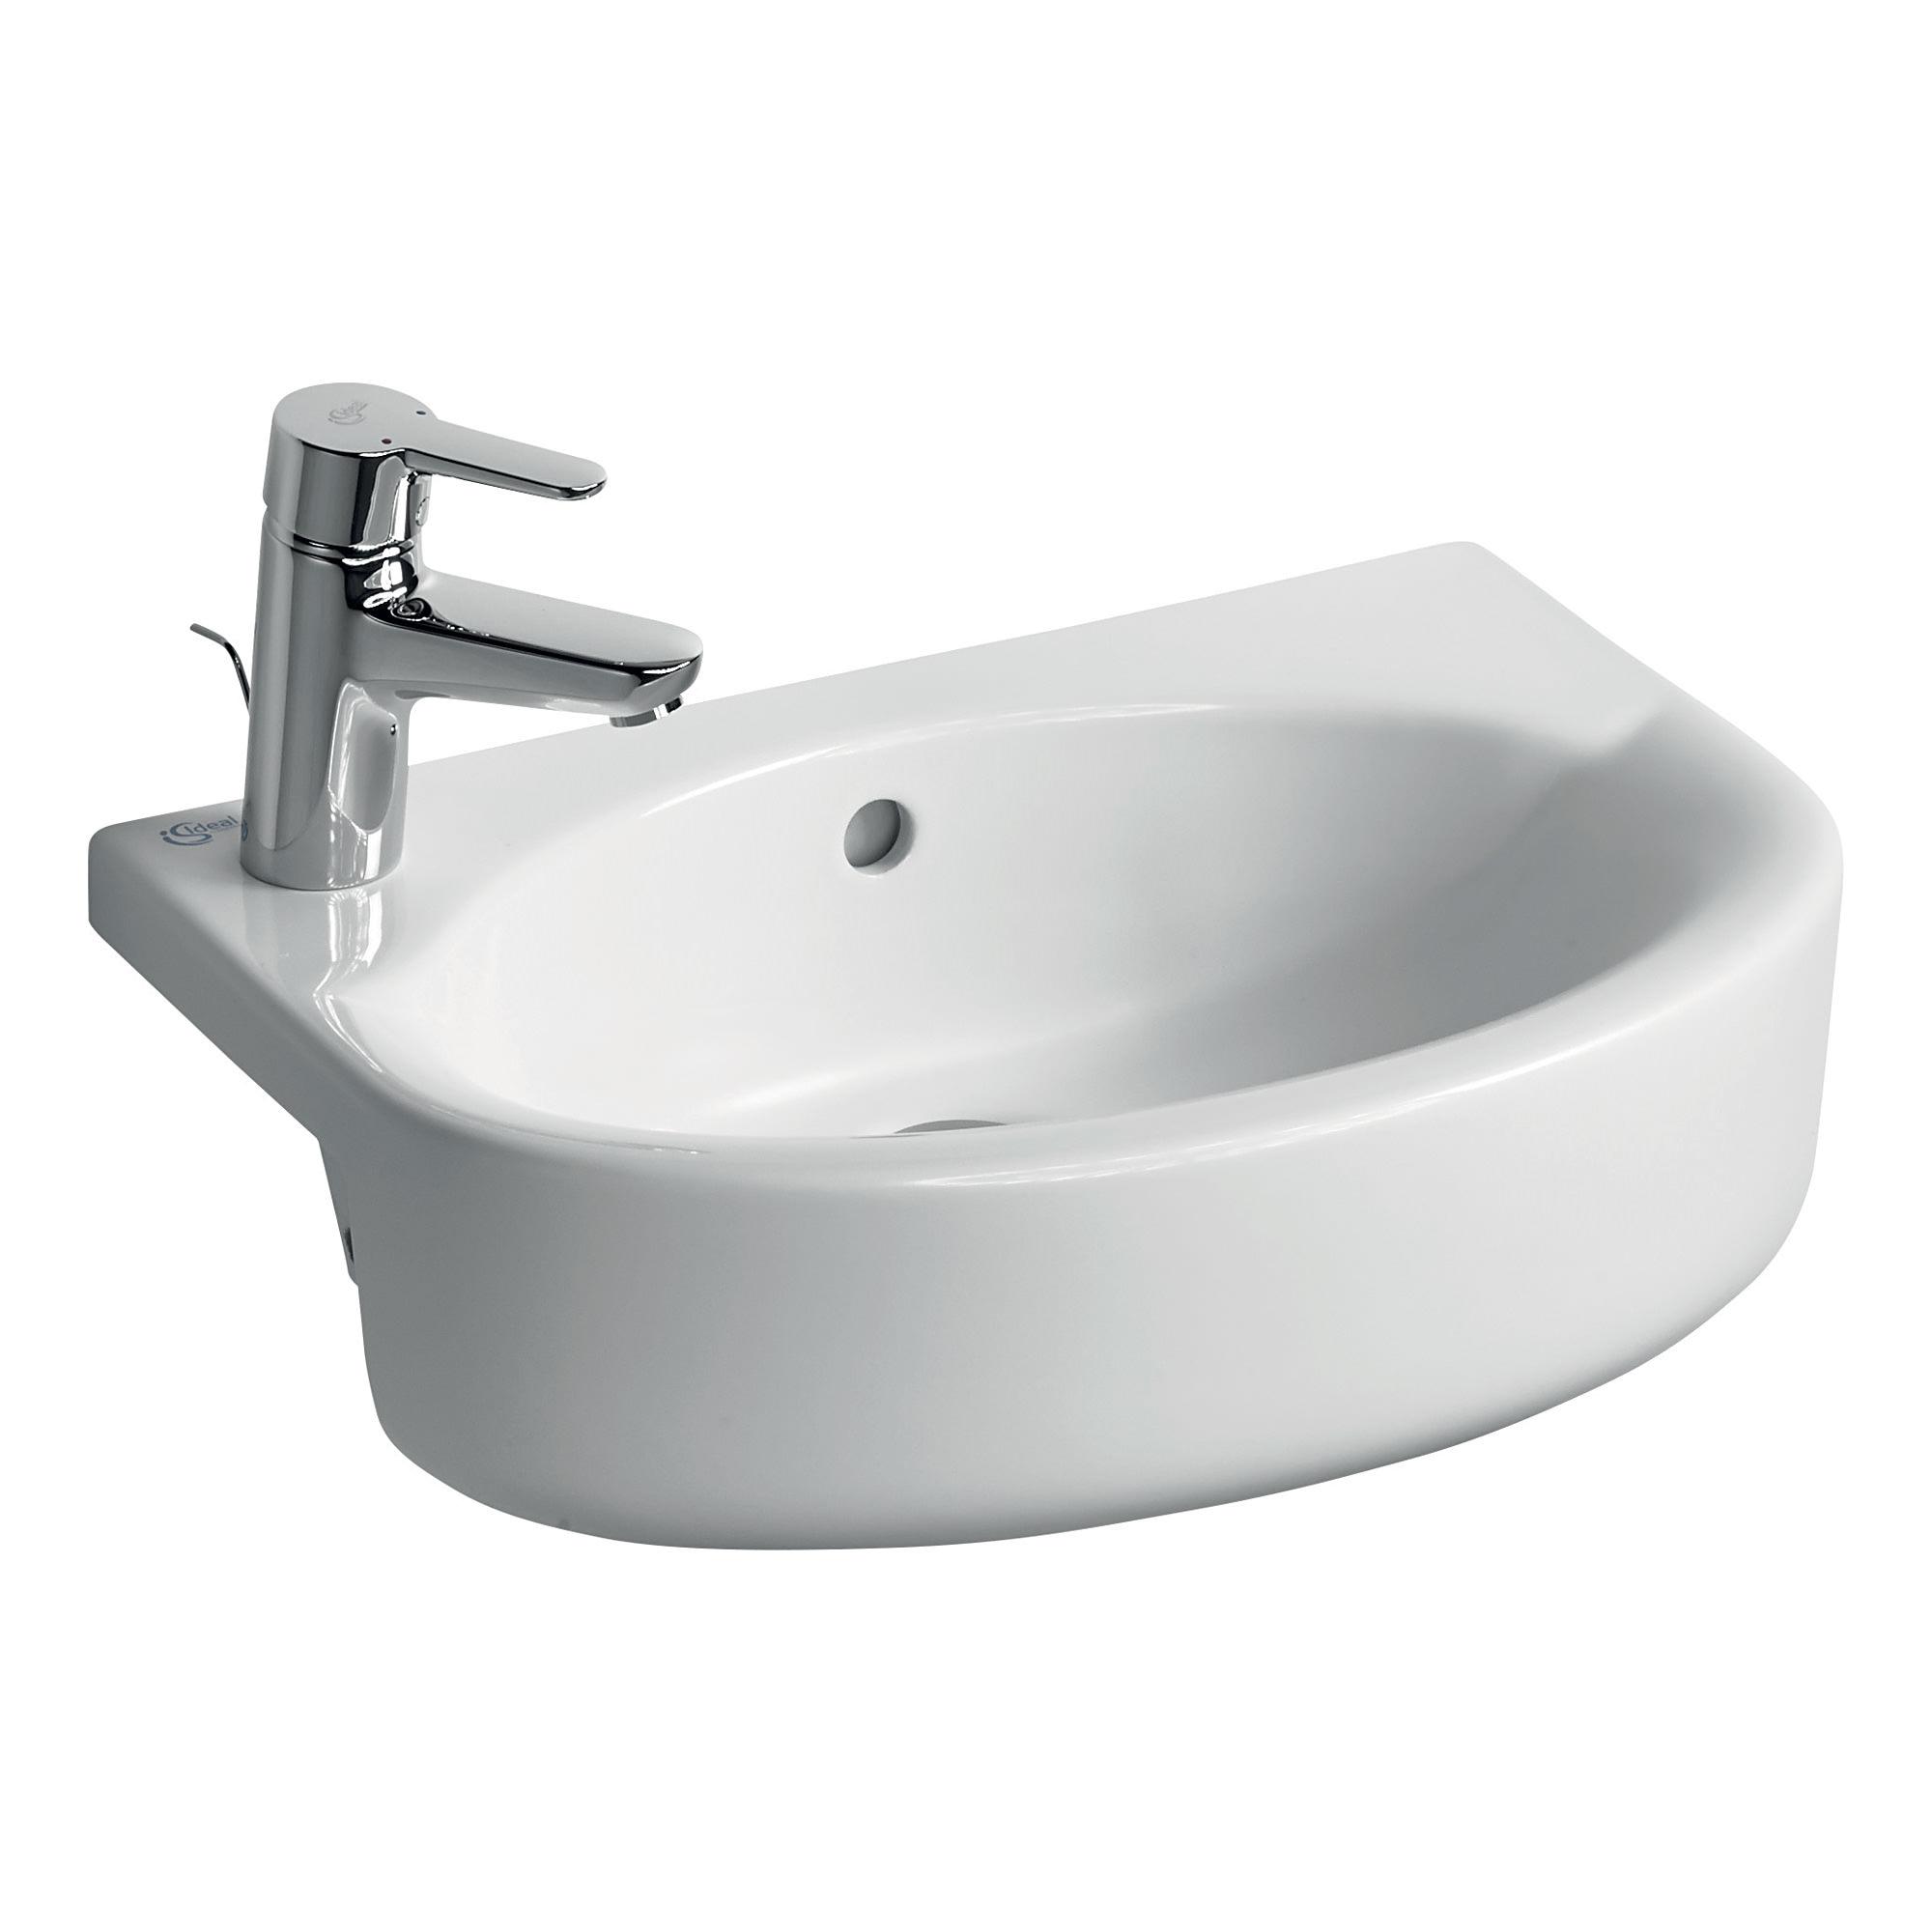 ideal standard concept space arc 50cm semi countertop basin. Black Bedroom Furniture Sets. Home Design Ideas